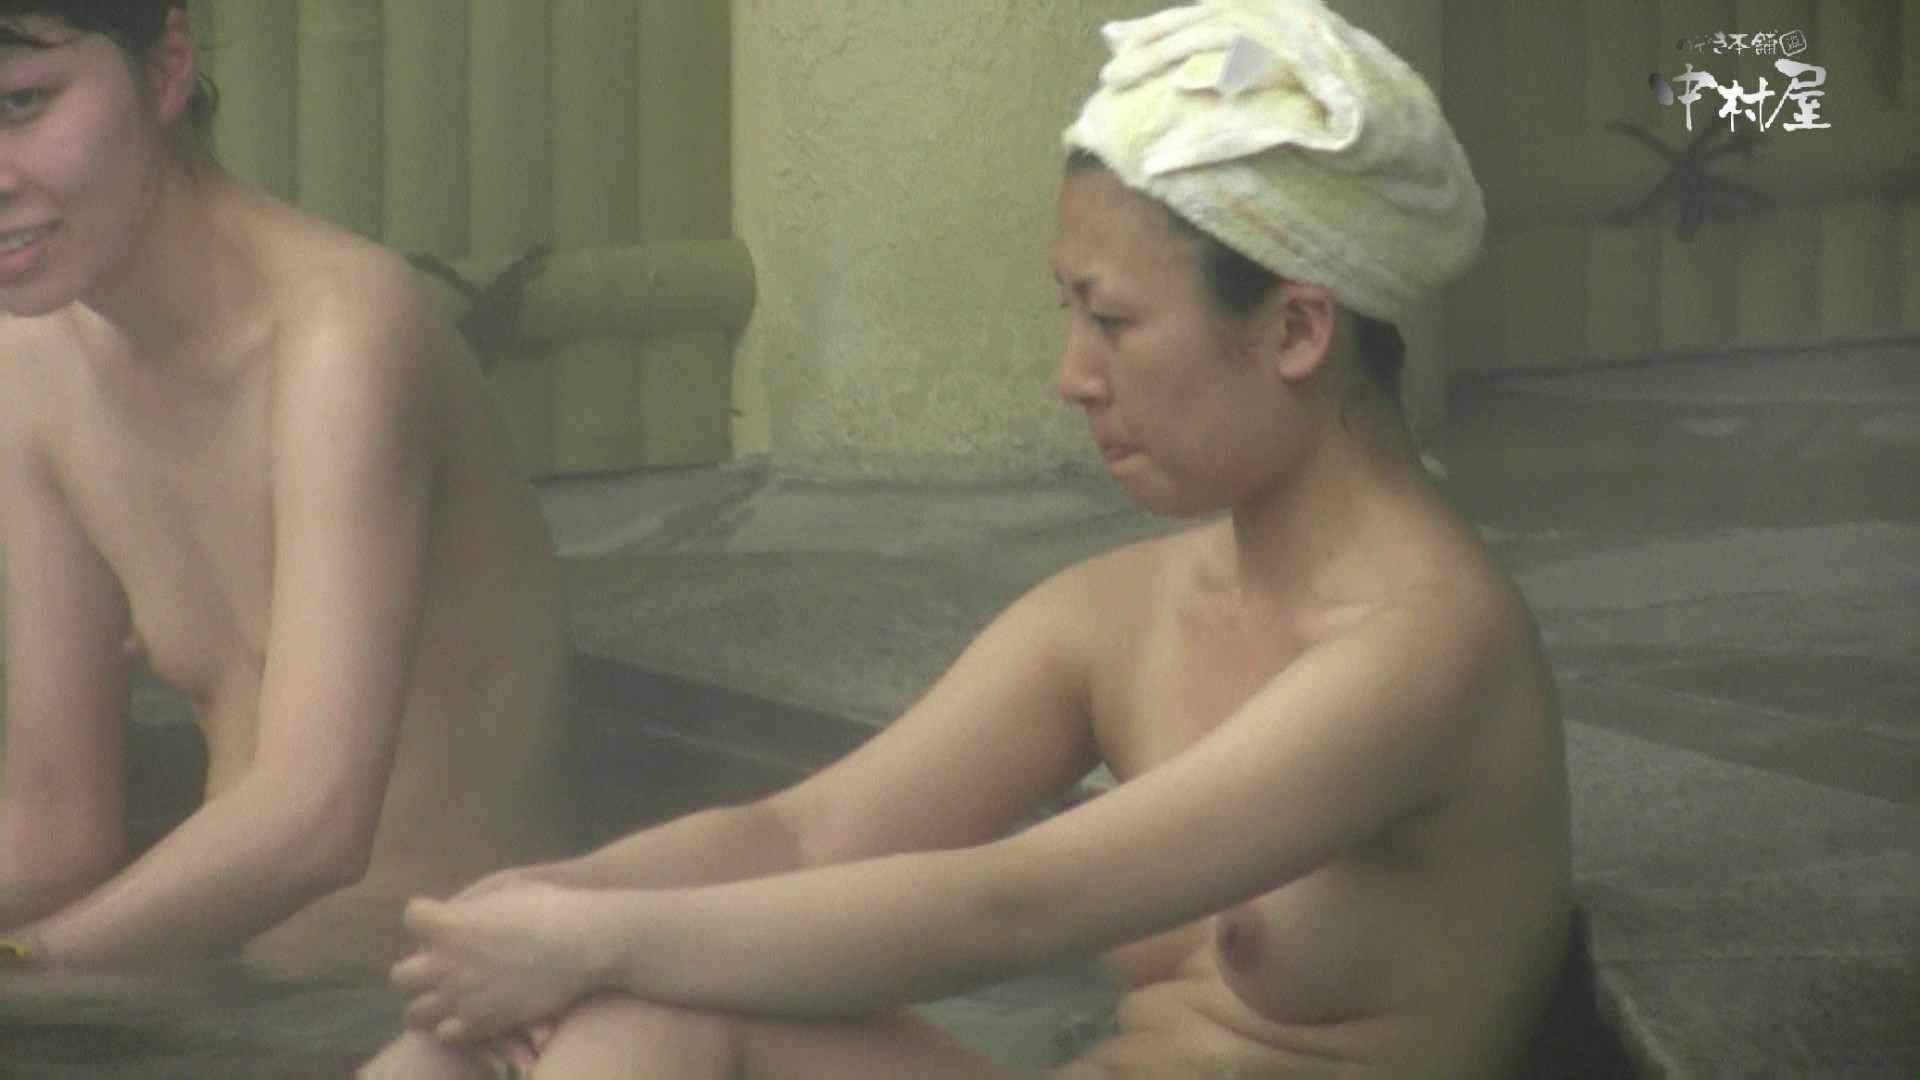 Aquaな露天風呂Vol.890 0  85連発 68